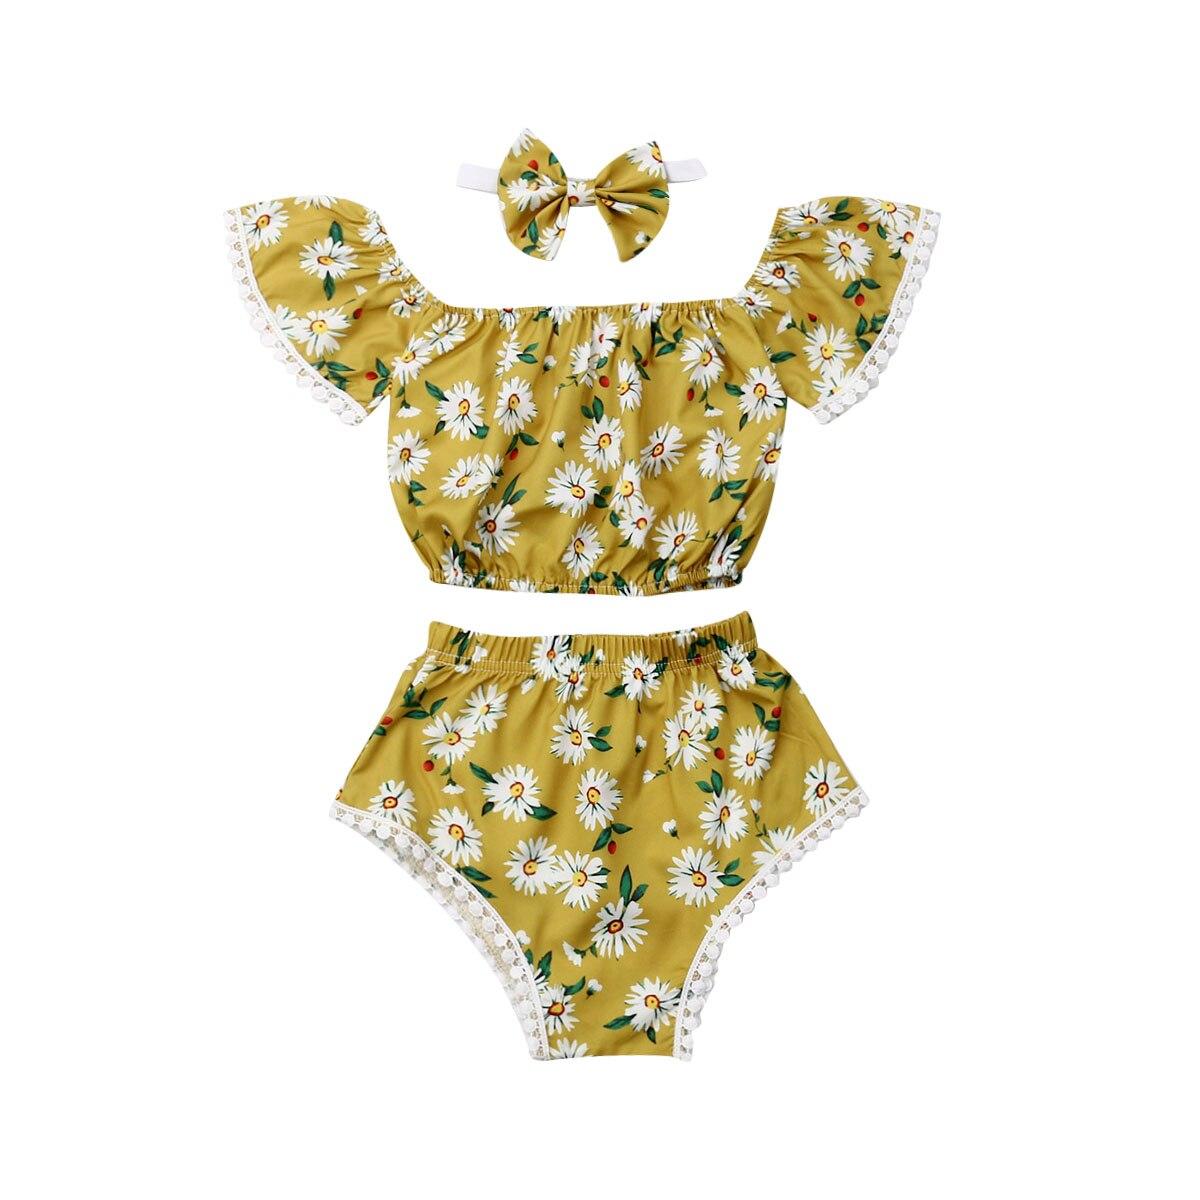 0-24M Summer Cute Infant Baby Girls Clothes Sets 3pcs Sunflowers Print Off Shoulder T-Shirts Tops+Shorts+Headband